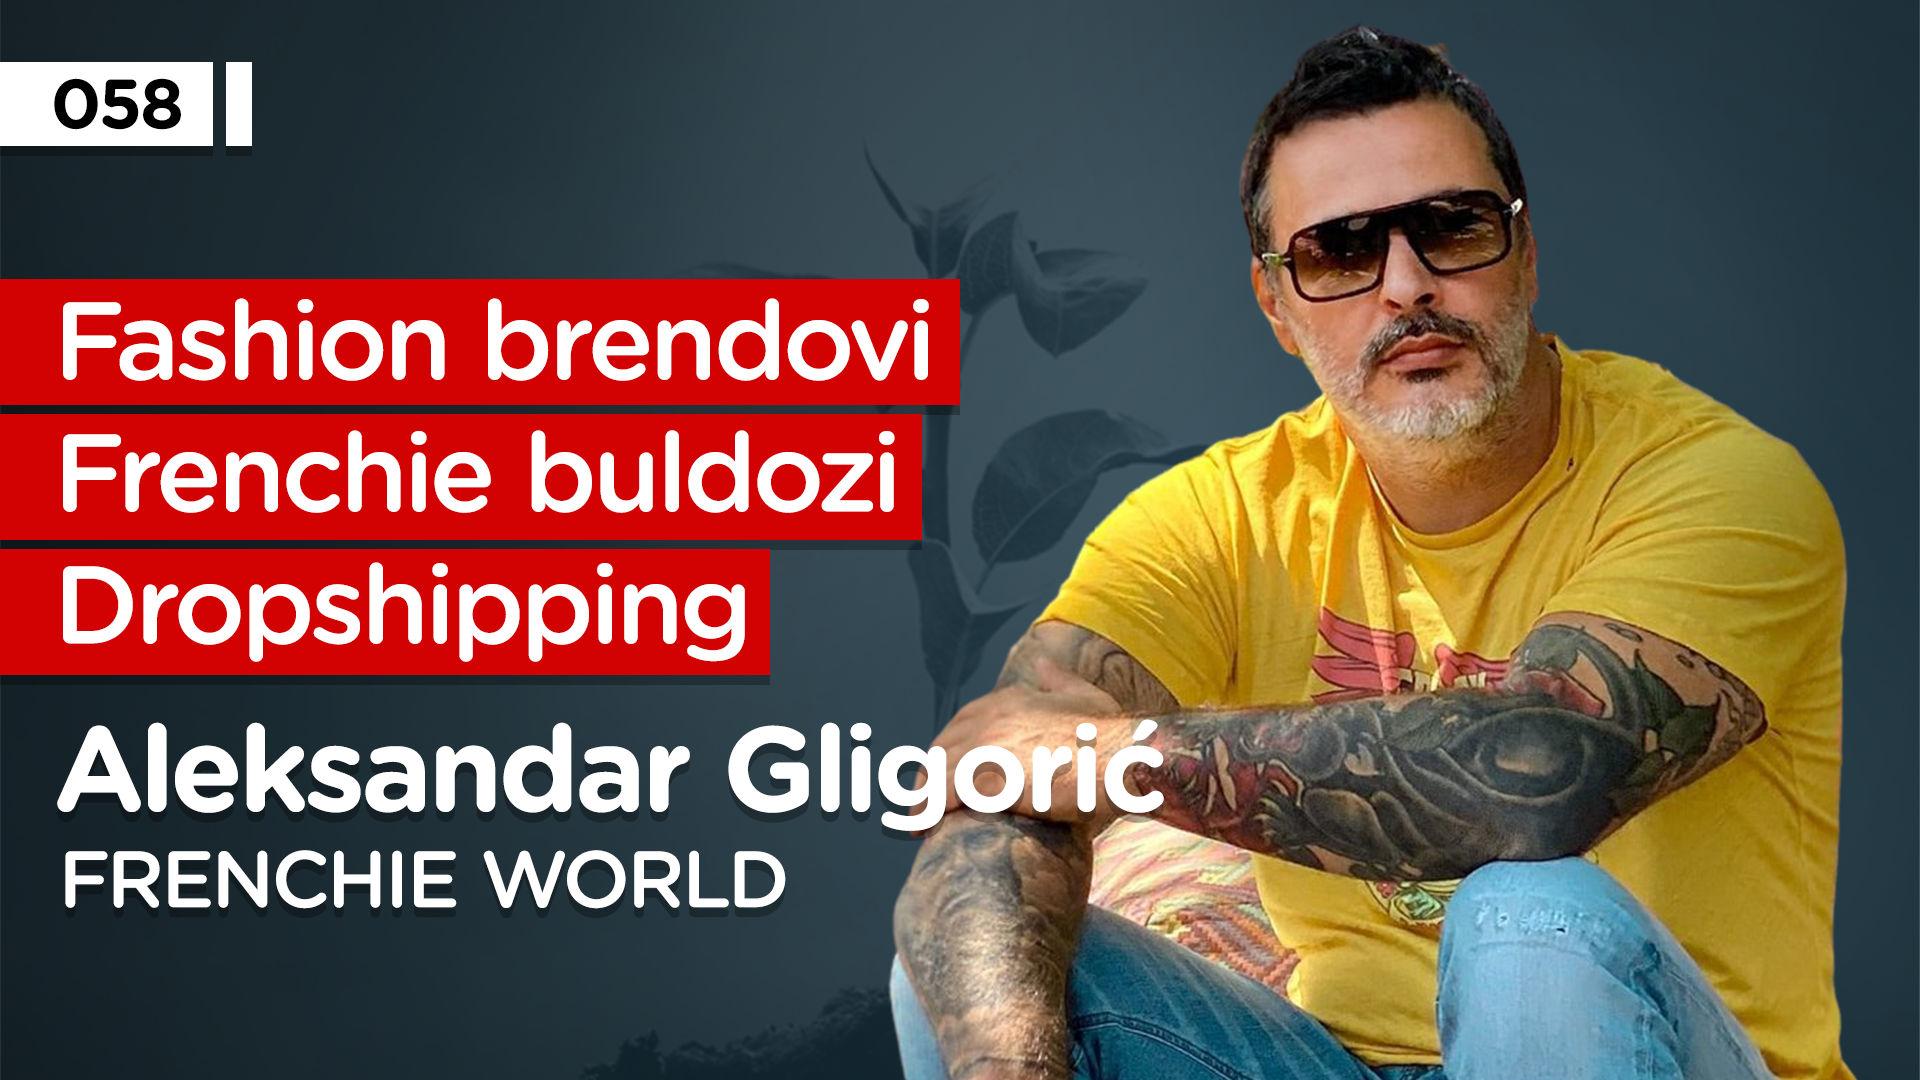 EP058: Aleksandar Gligorić